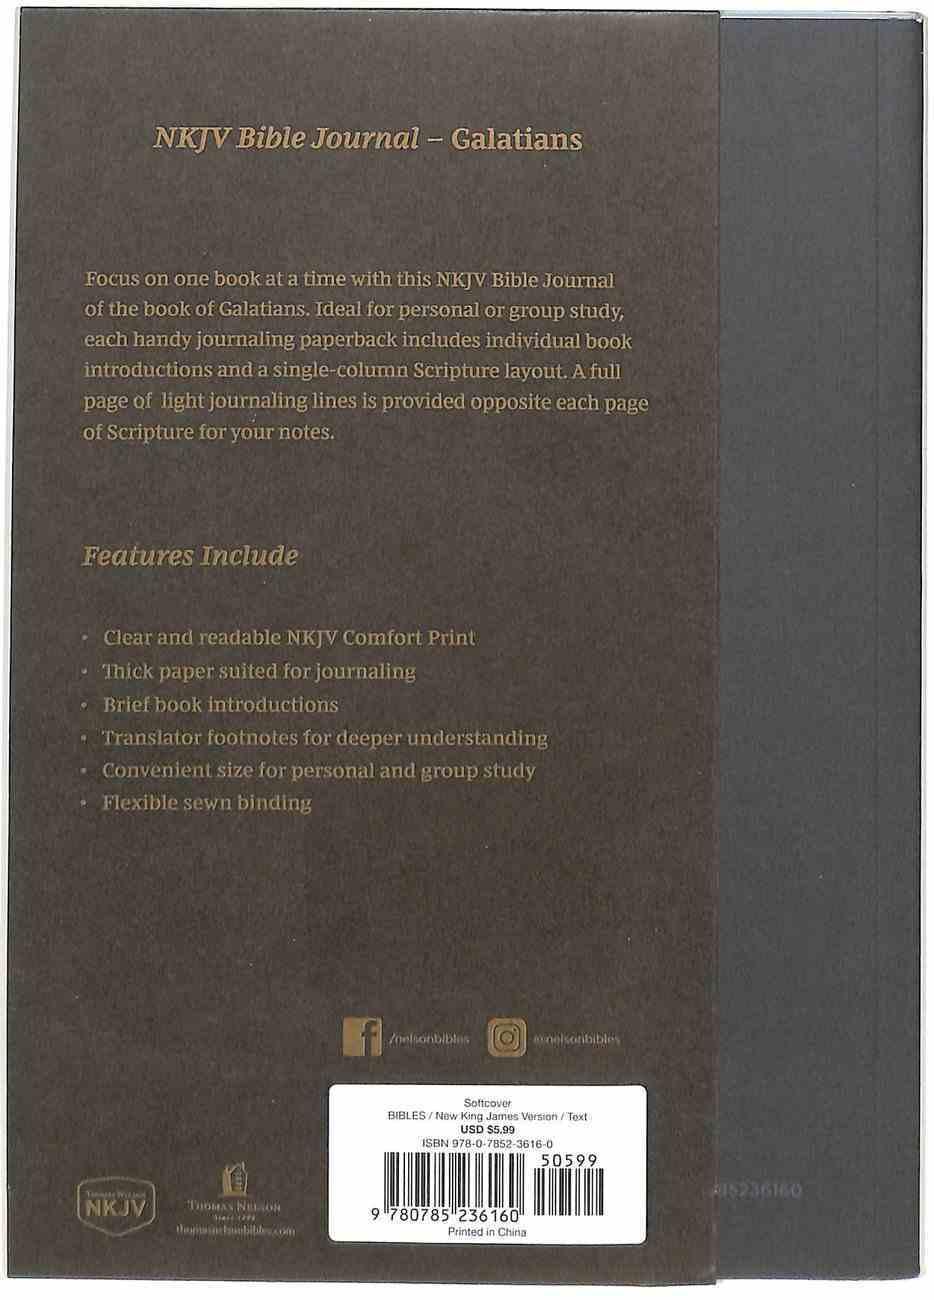 NKJV Bible Journal - Galatians Paperback